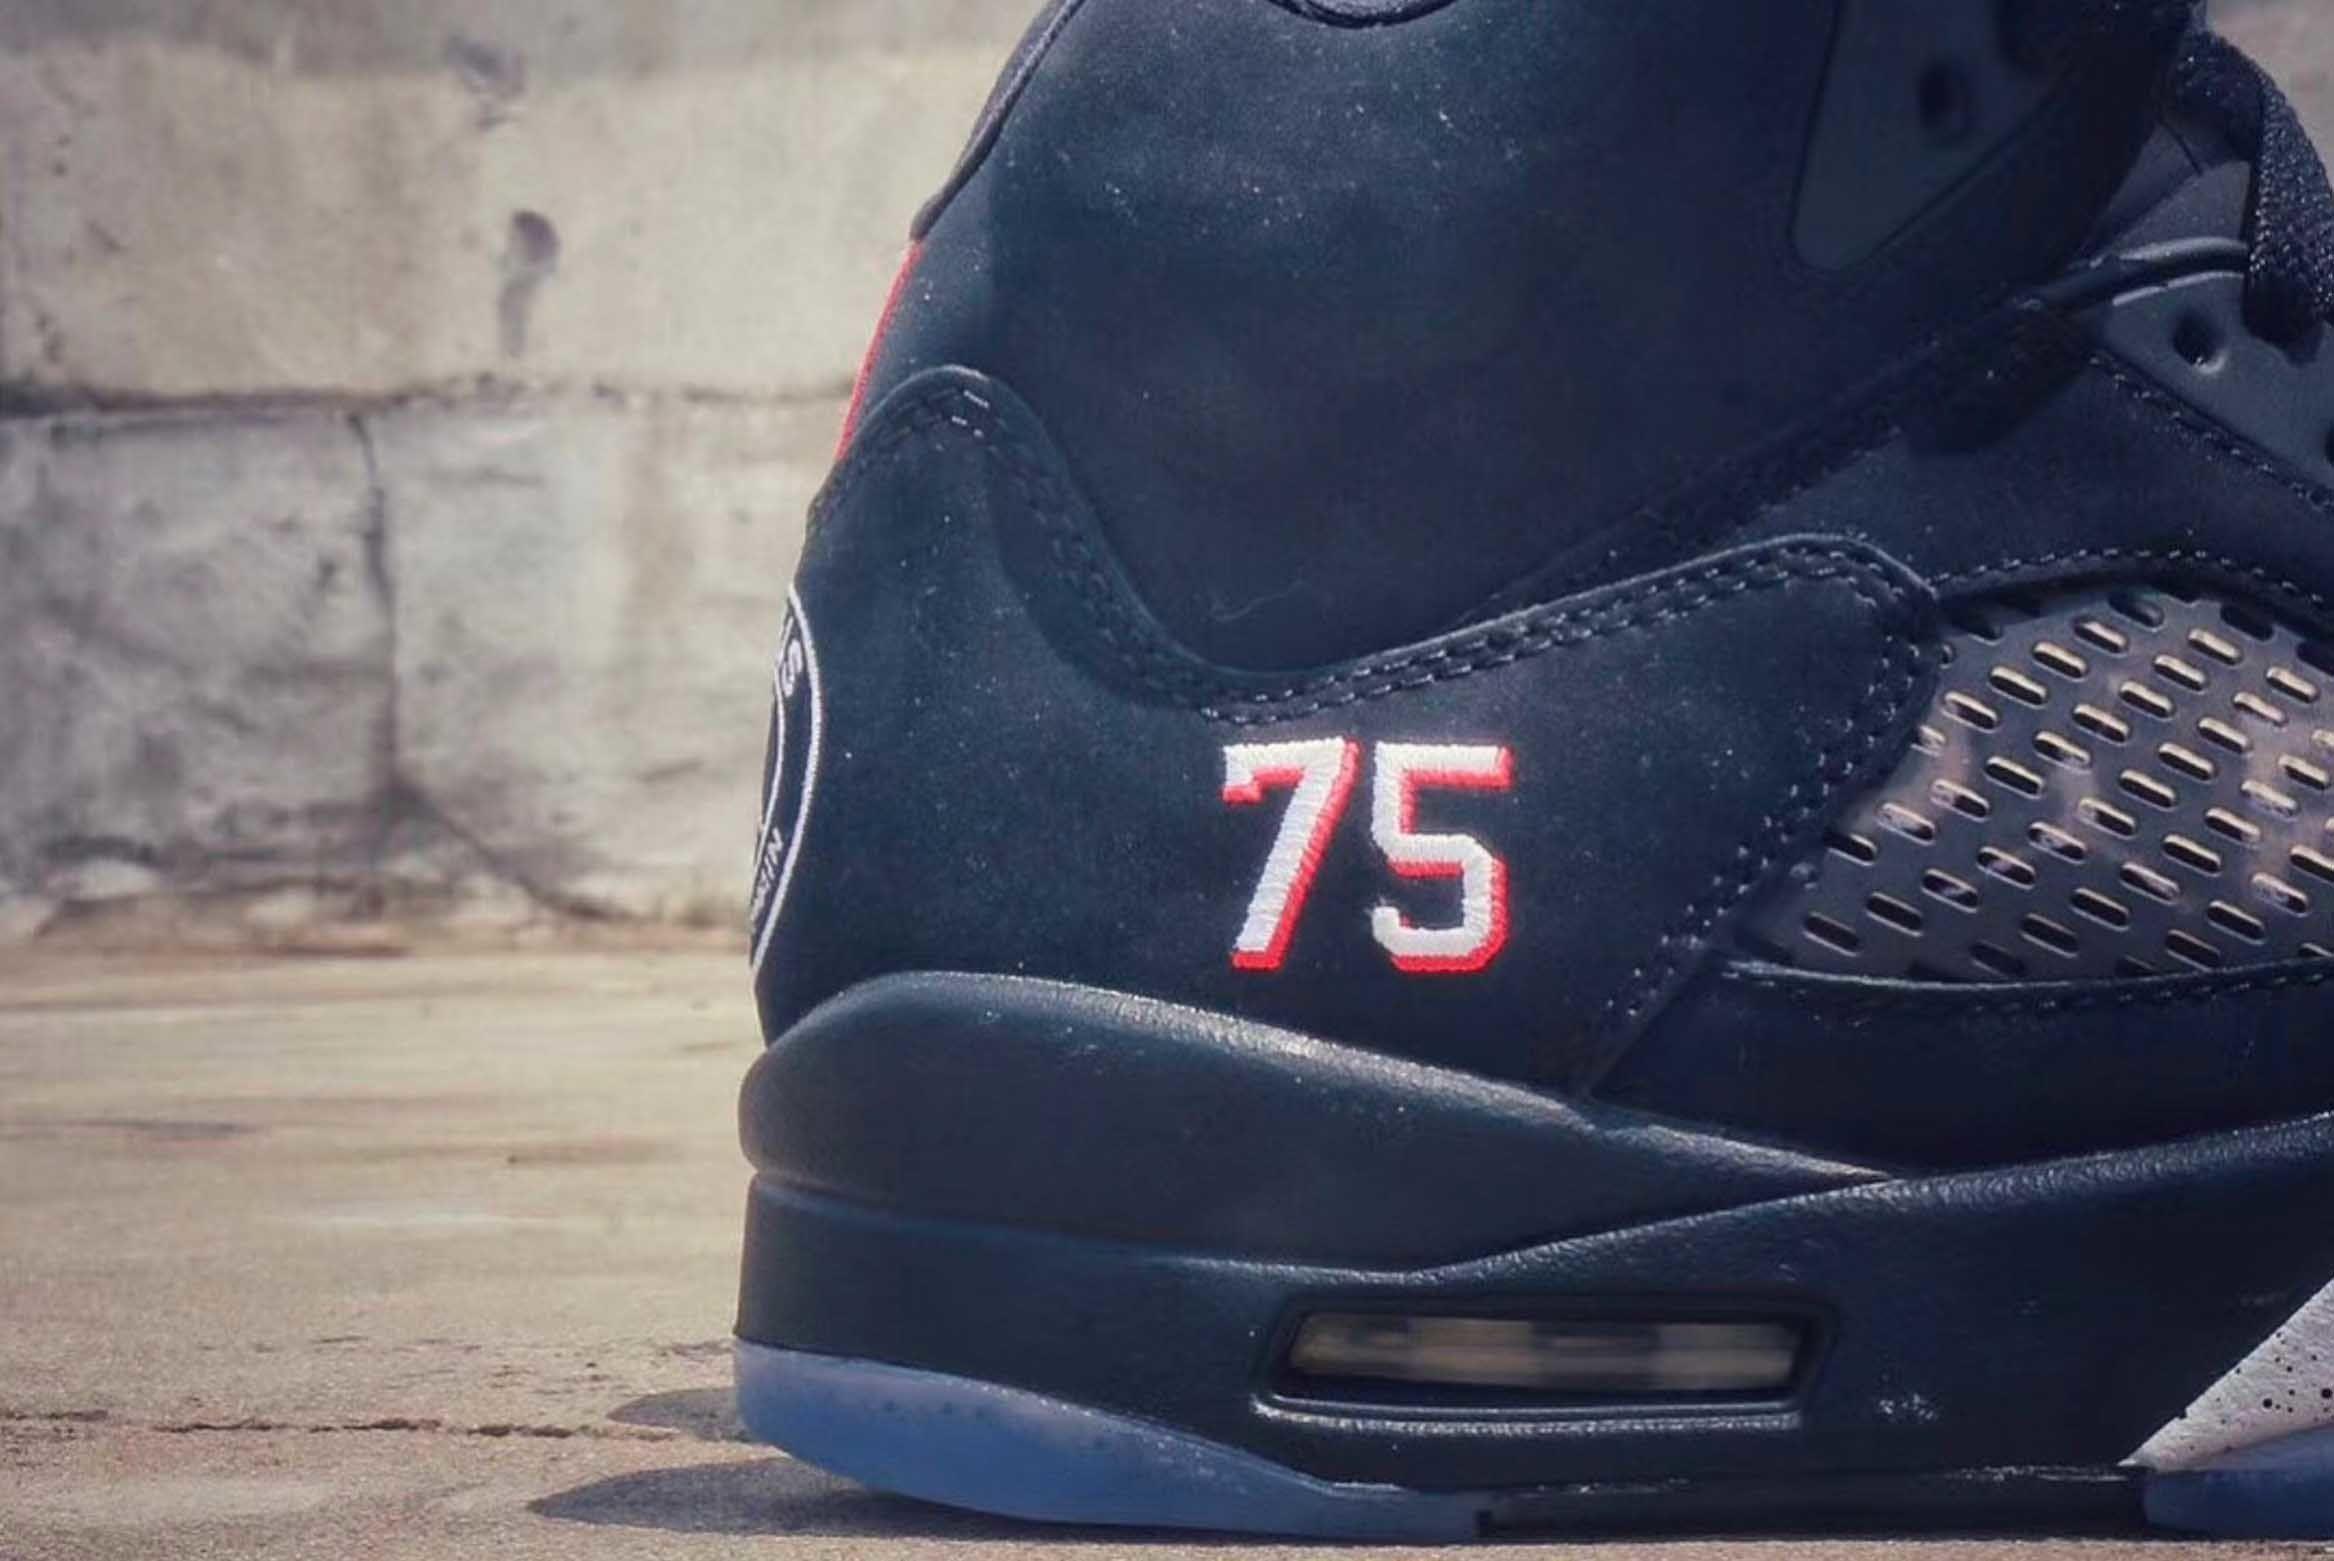 Air Jordan 5 Retro Paris Saint Germain First Look 3 Sneaker Freaker